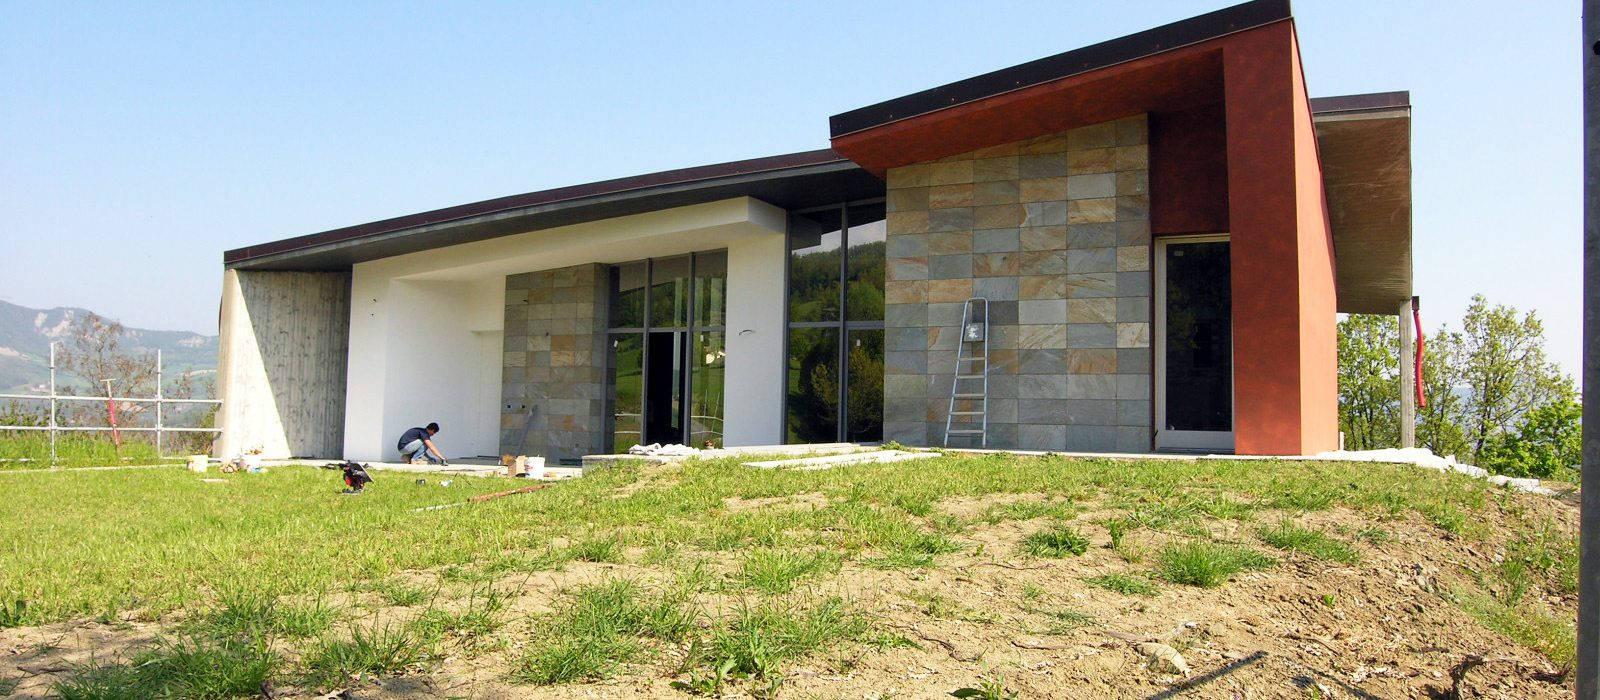 22_house_rita_progetto_studio_architettura_giuseppe_passaro